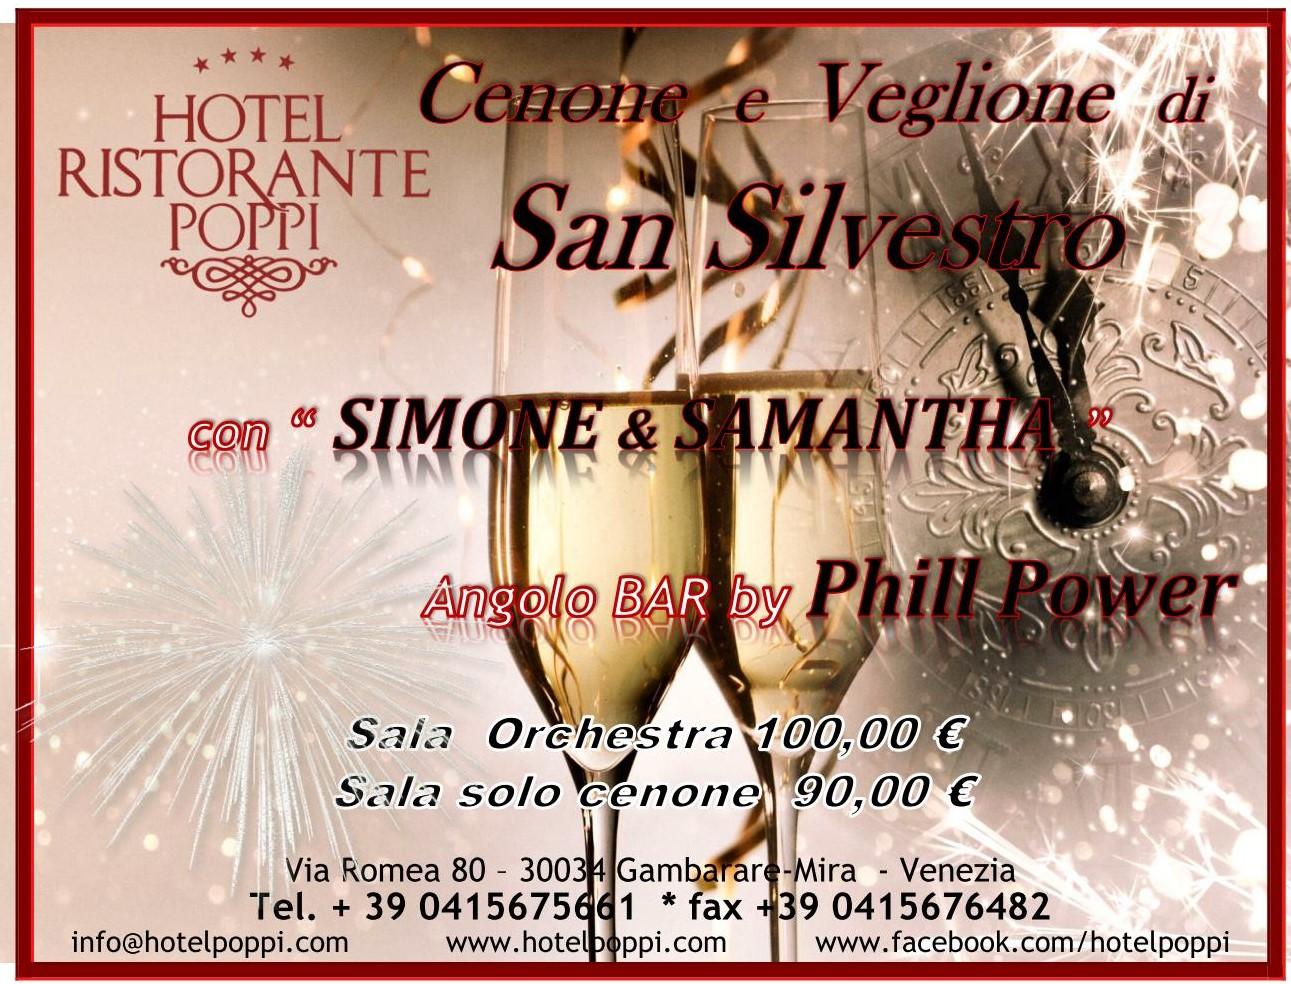 San Silvestro, 31 Dicembre 2019